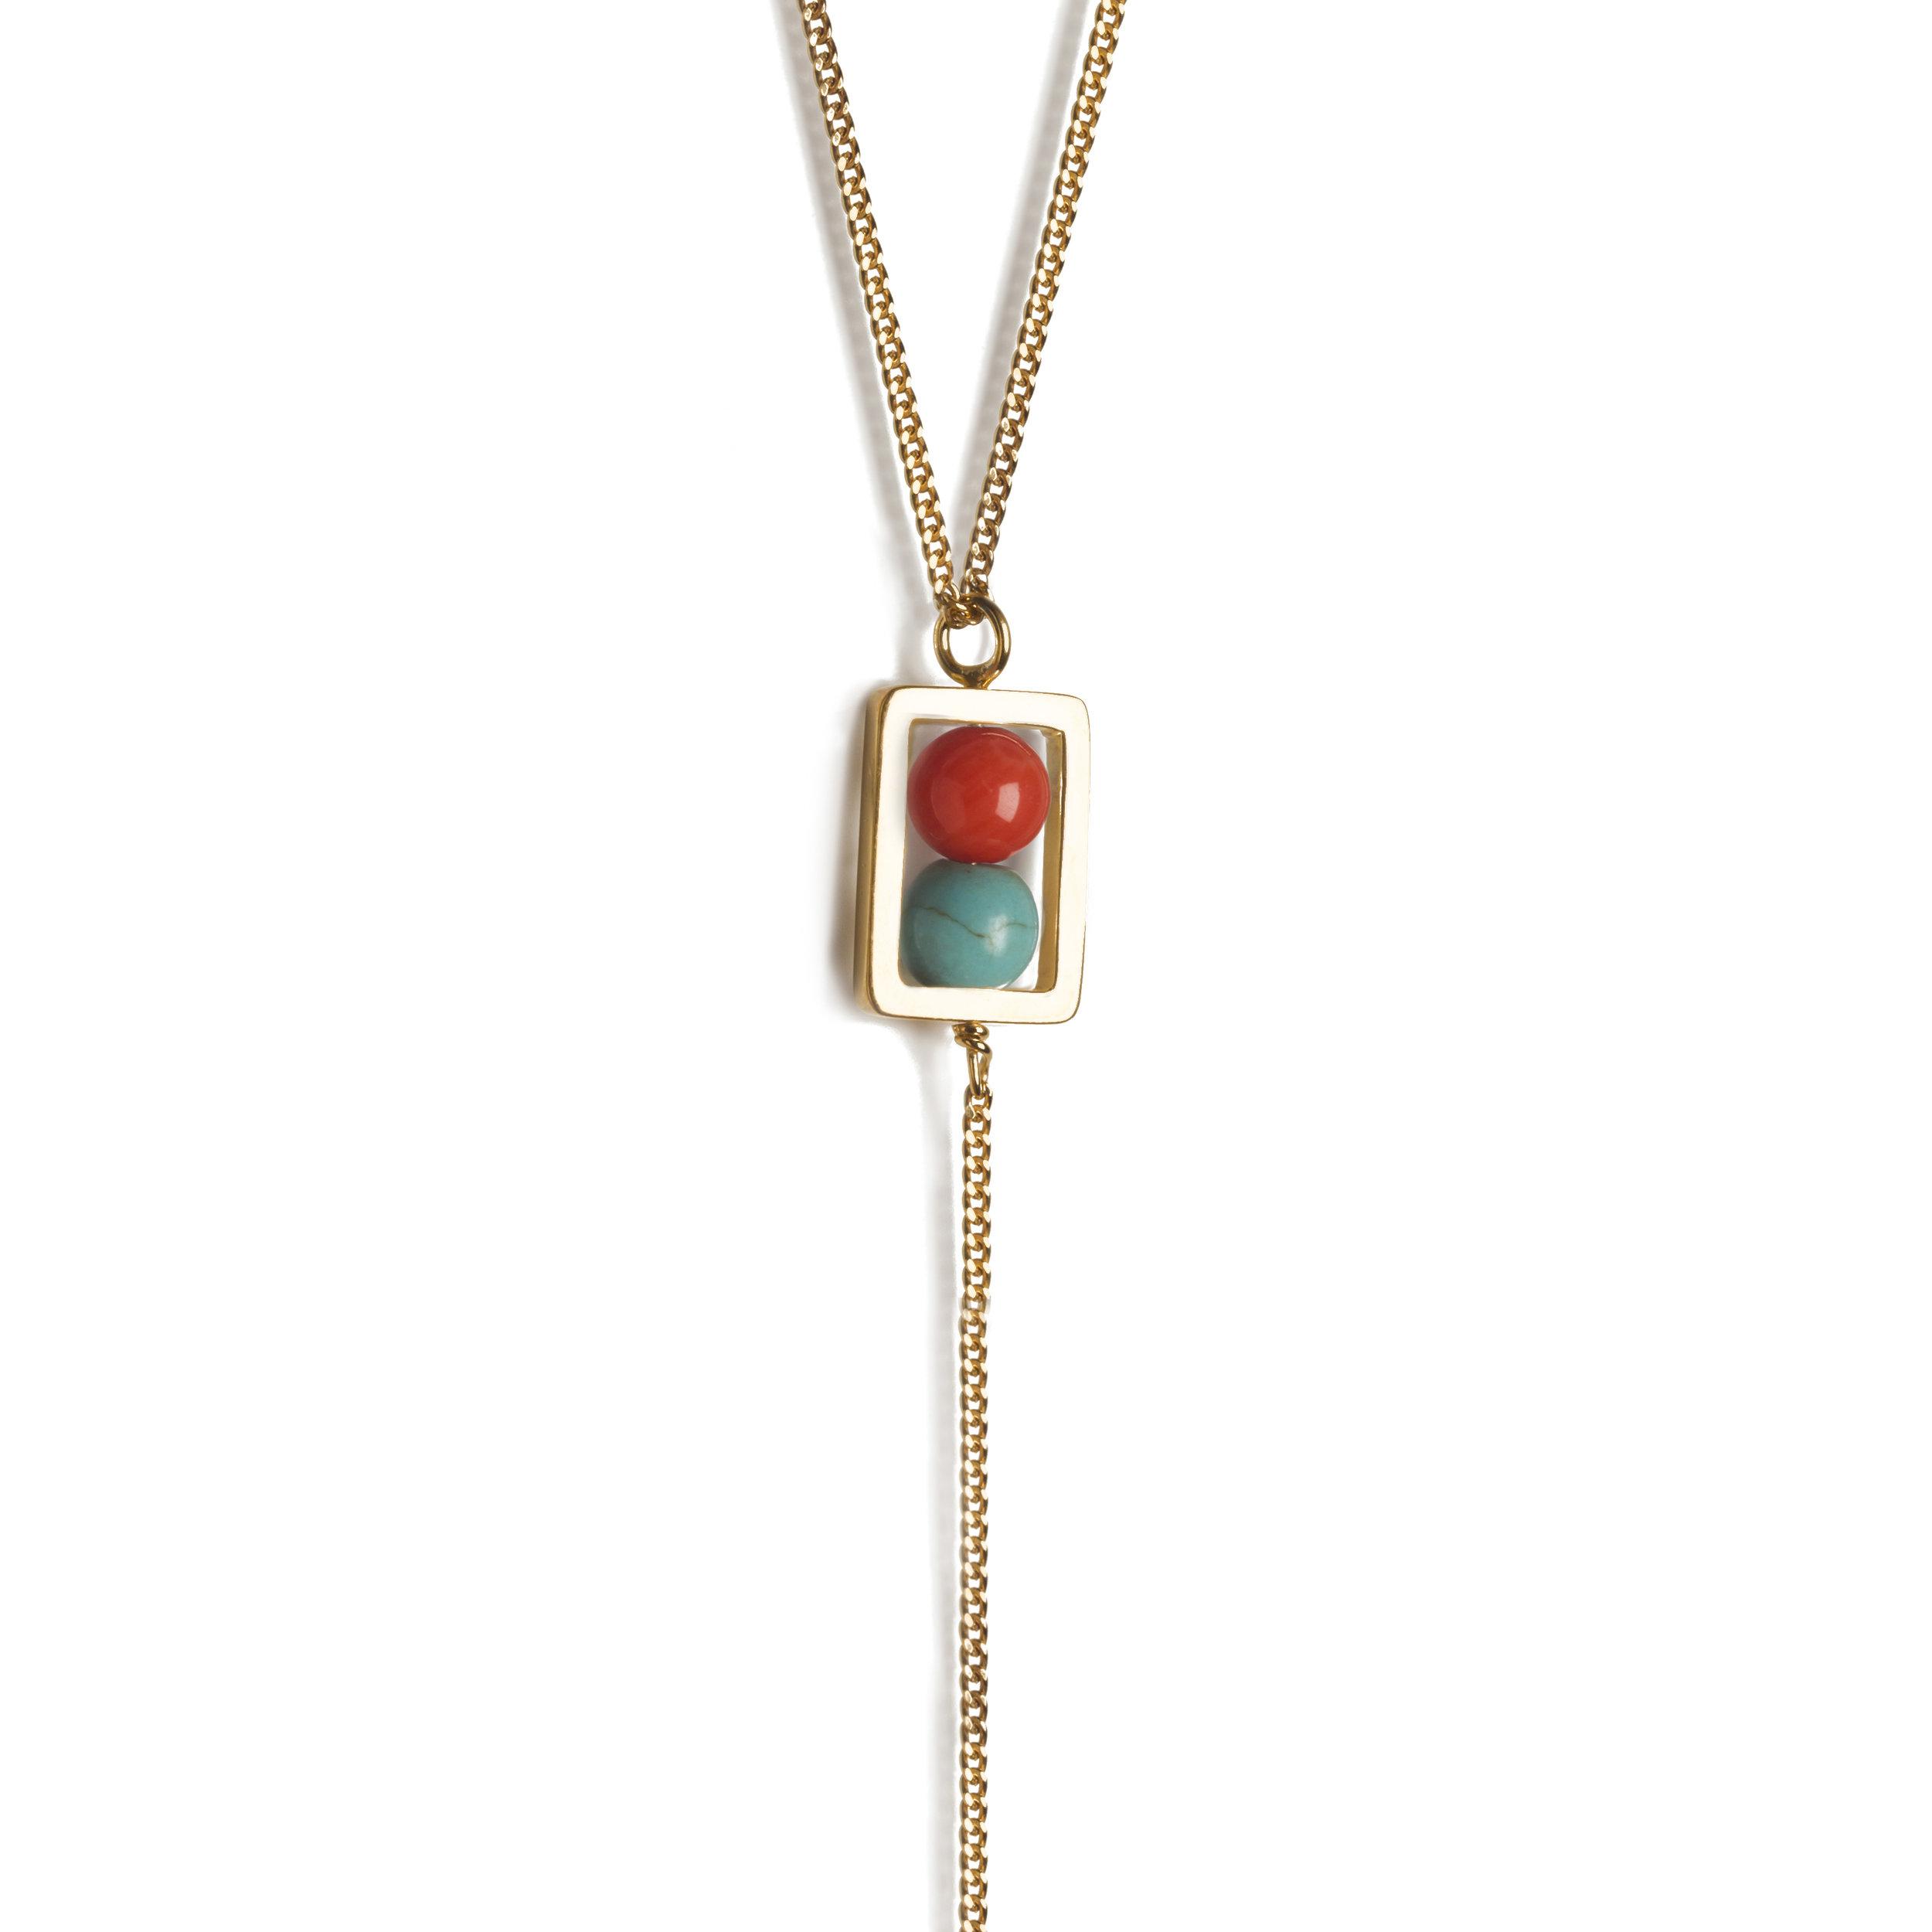 Lana_necklace_w_frame_turquoise_coral_malachite_gold.jpg